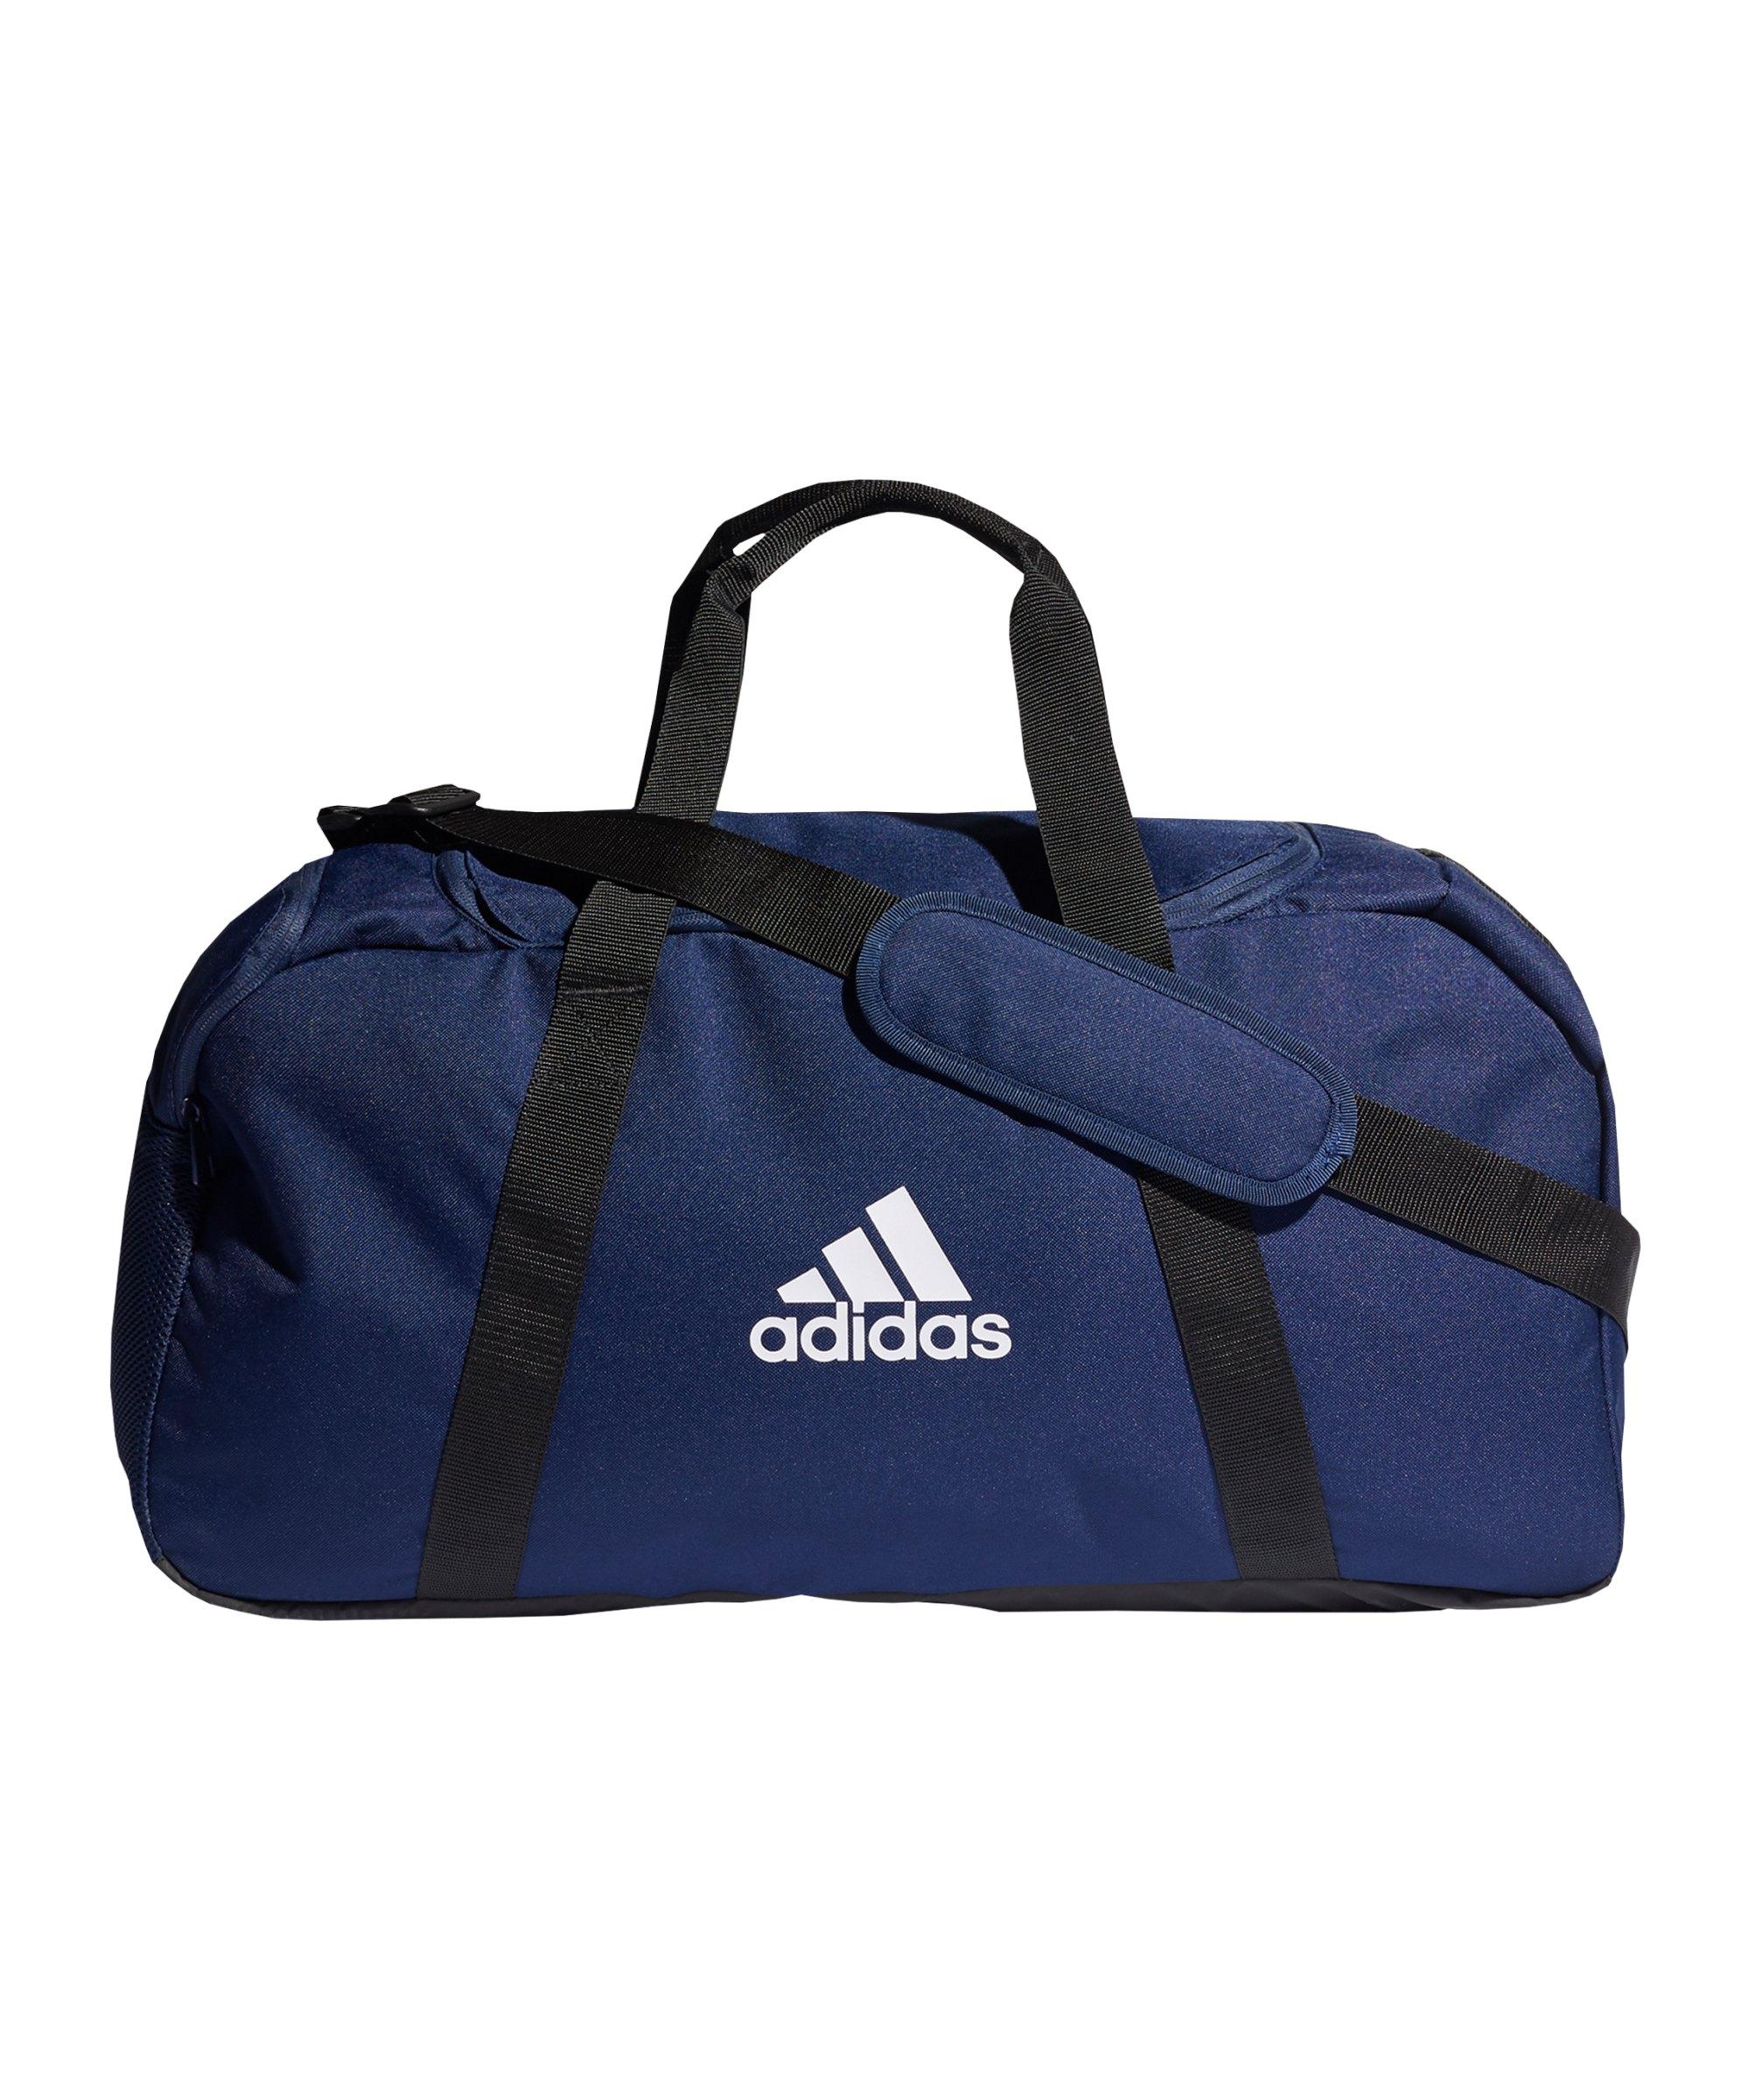 adidas Tiro Duffle Bag Gr. M Blau - blau